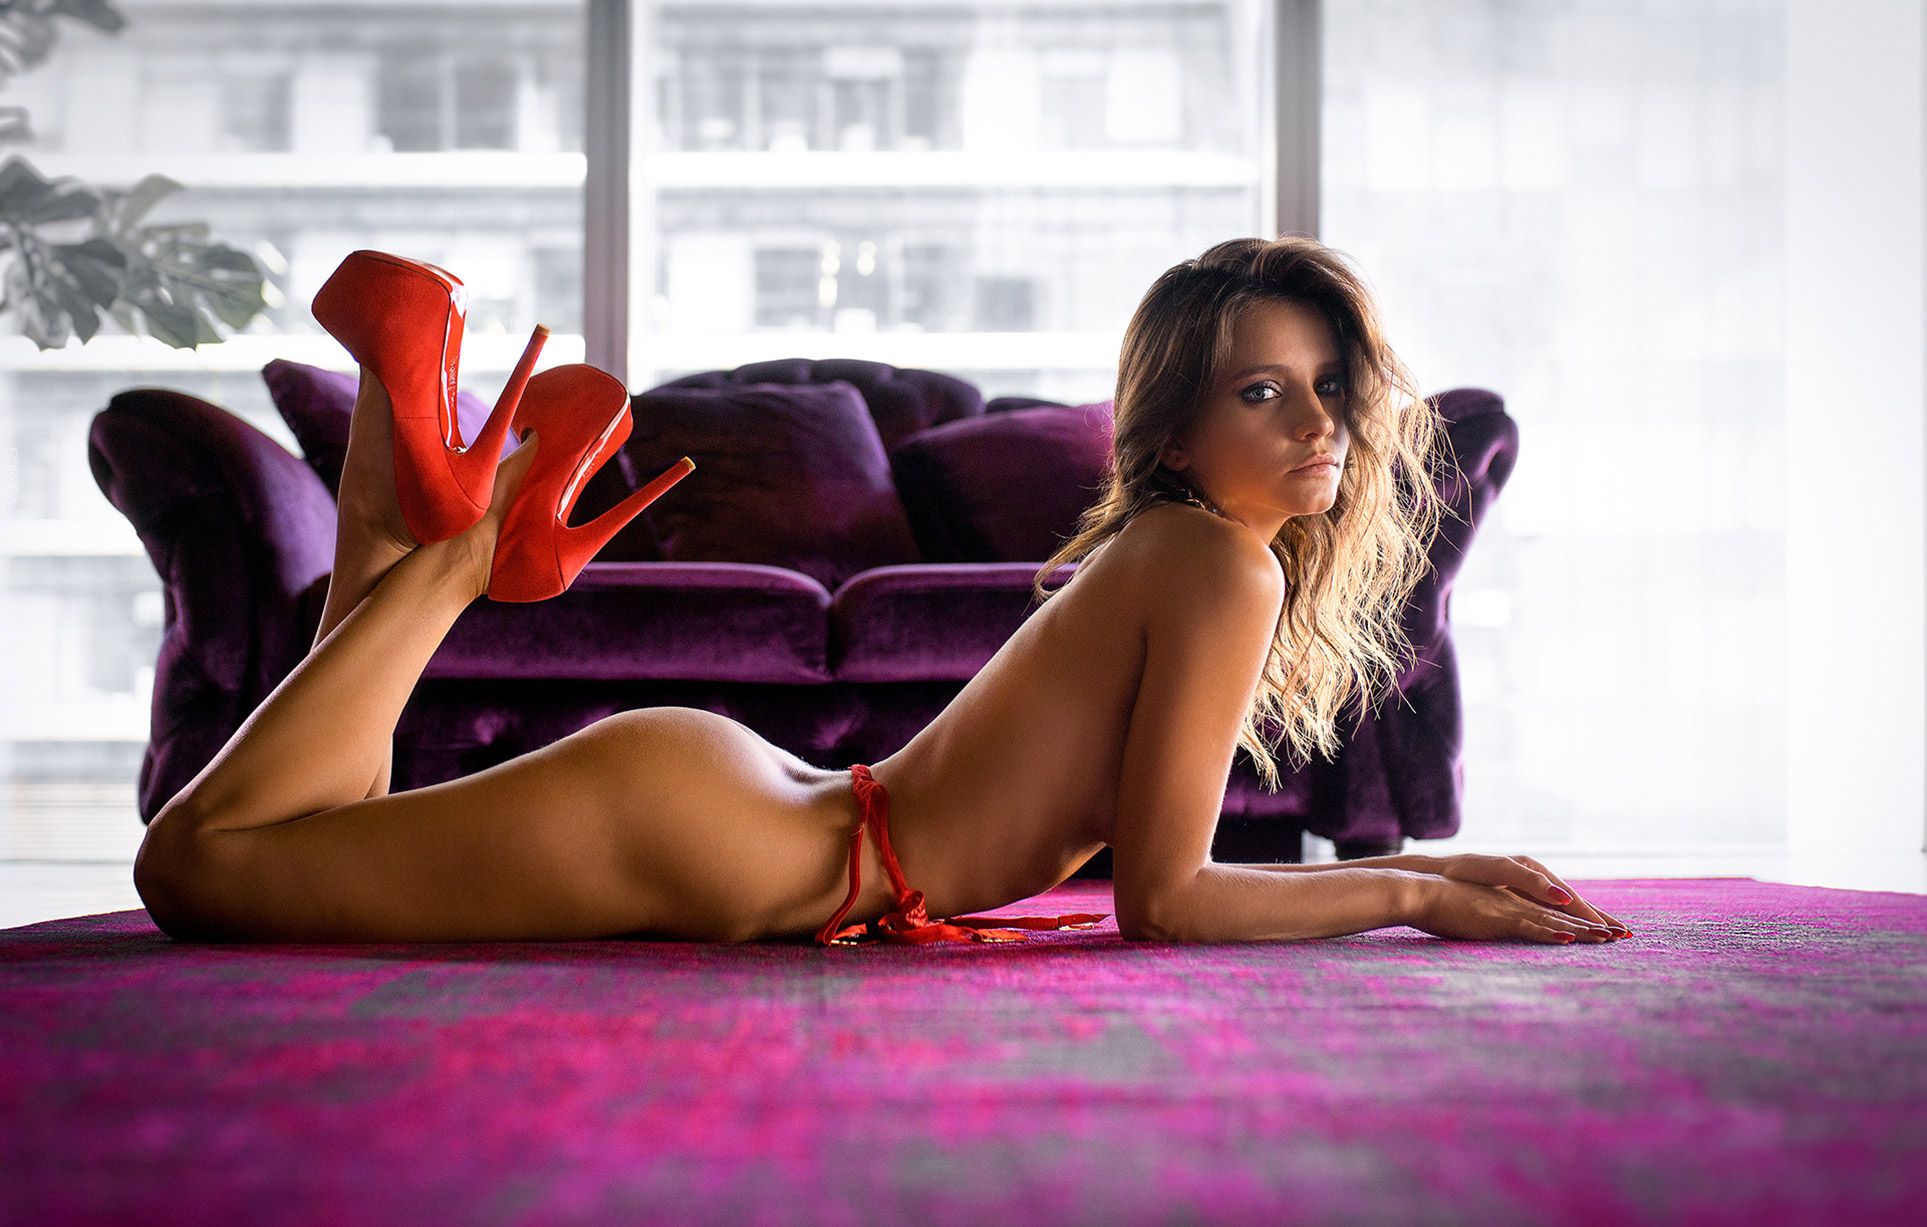 Кристина Макарова разделась по-богатому / Kristina Makarova by Vladimir Nikolaev